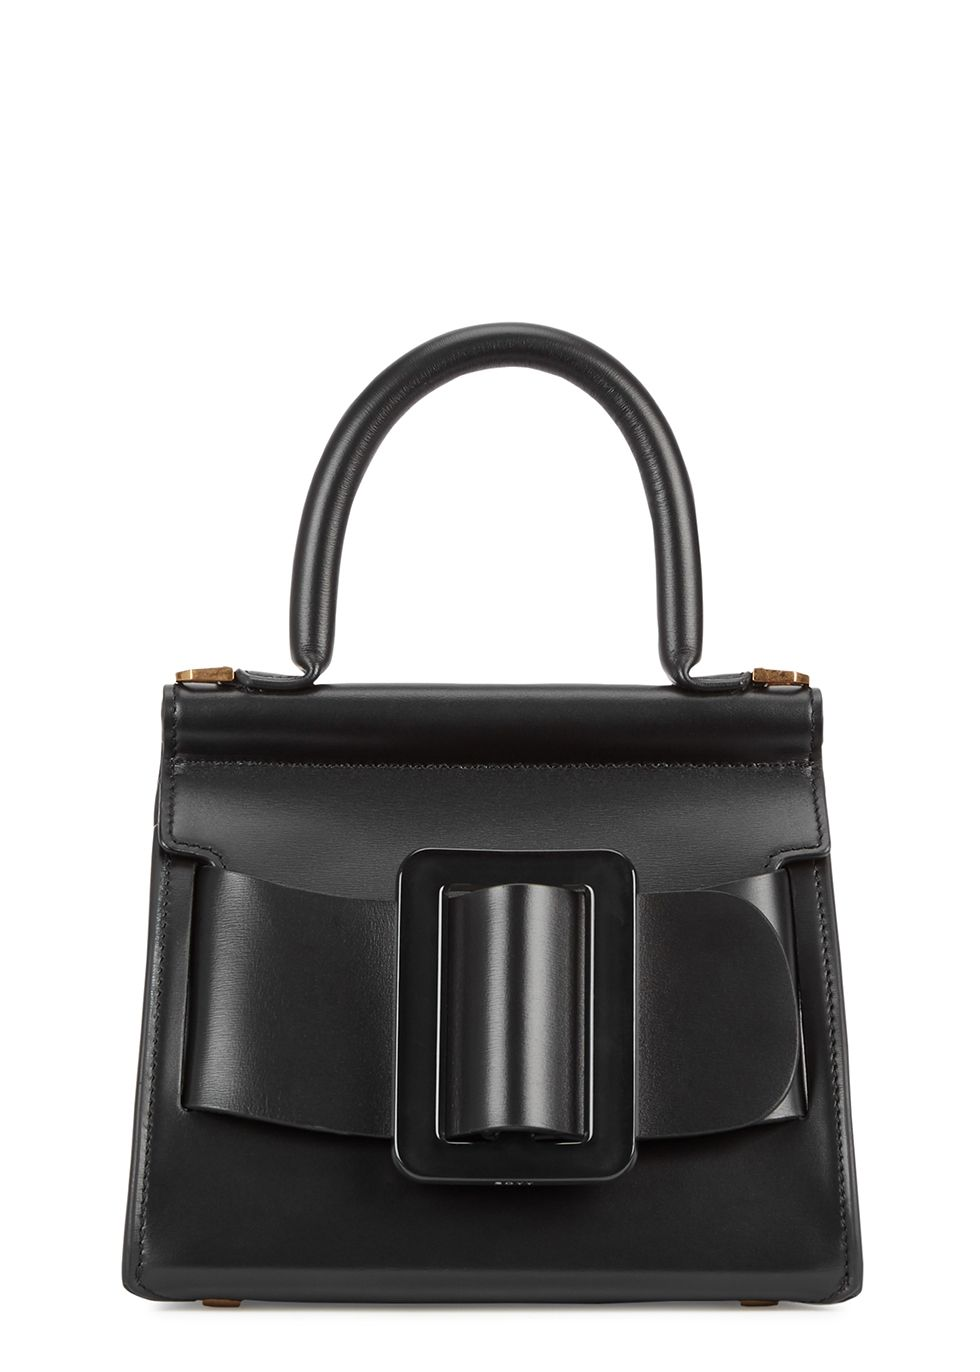 Karl 19 black leather cross-body bag - Boyy USD 844.17  4cbf4797685d8